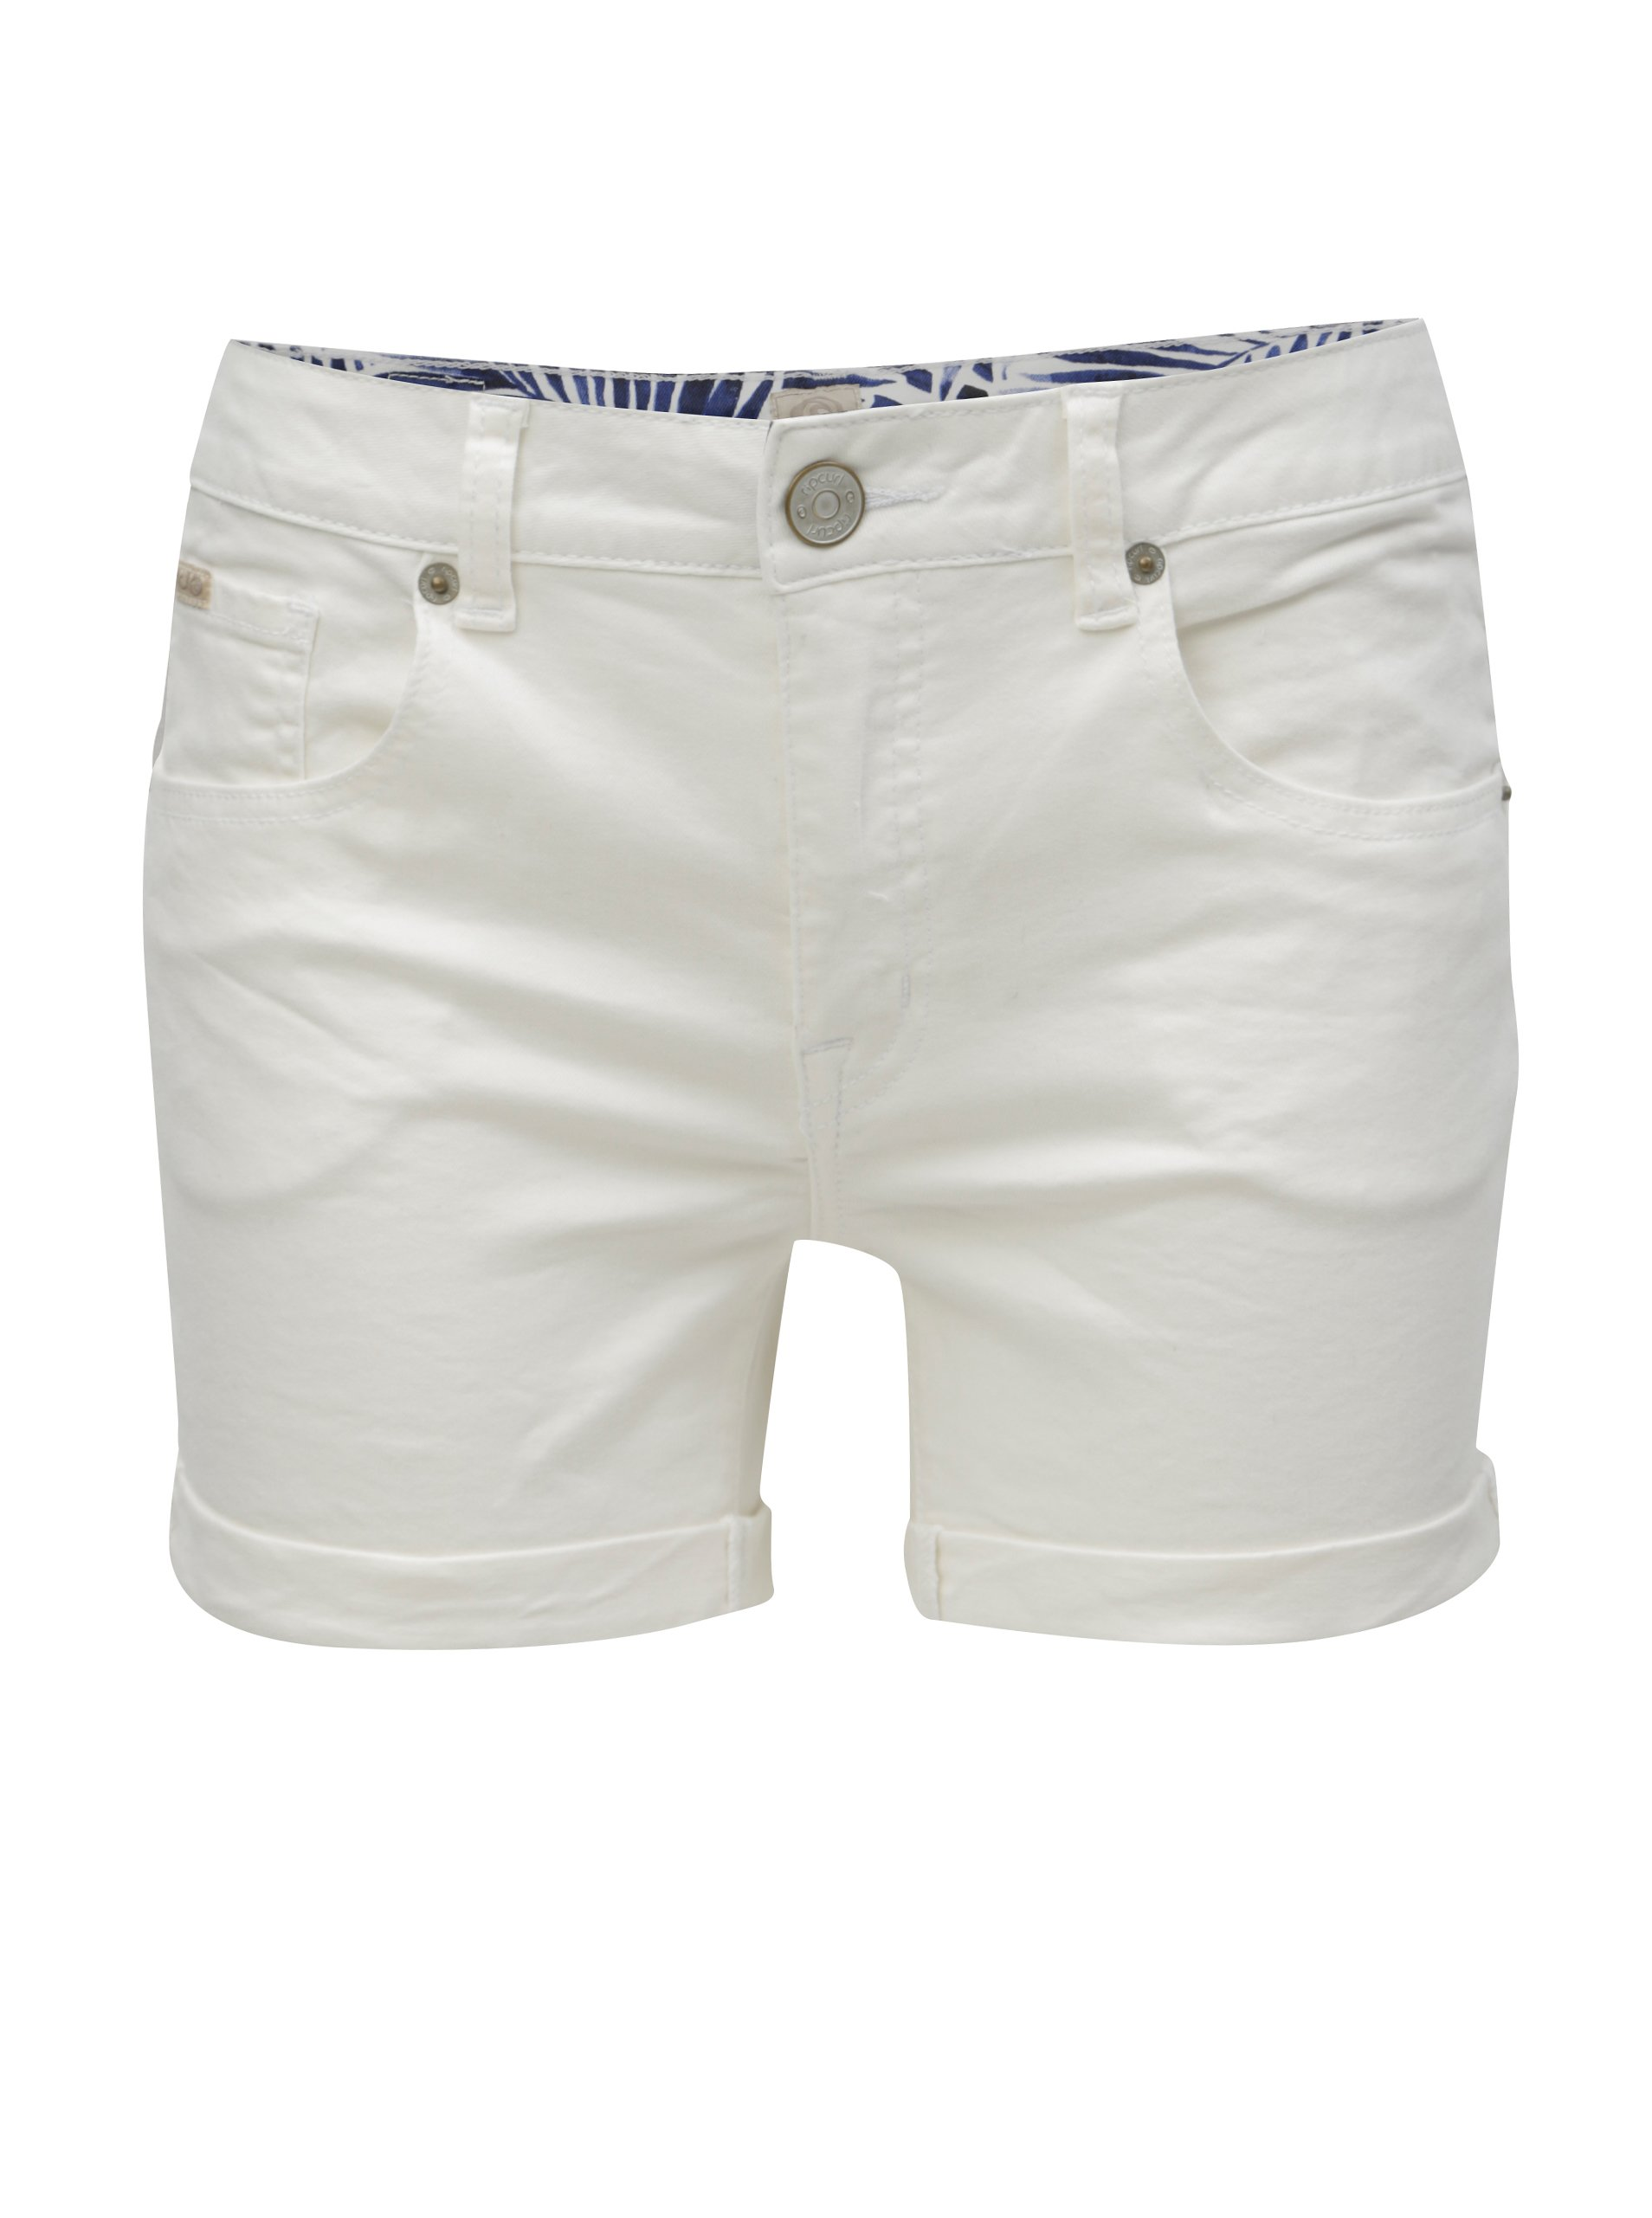 Bílé dámské džínové kraťasy Rip Curl fd61450632